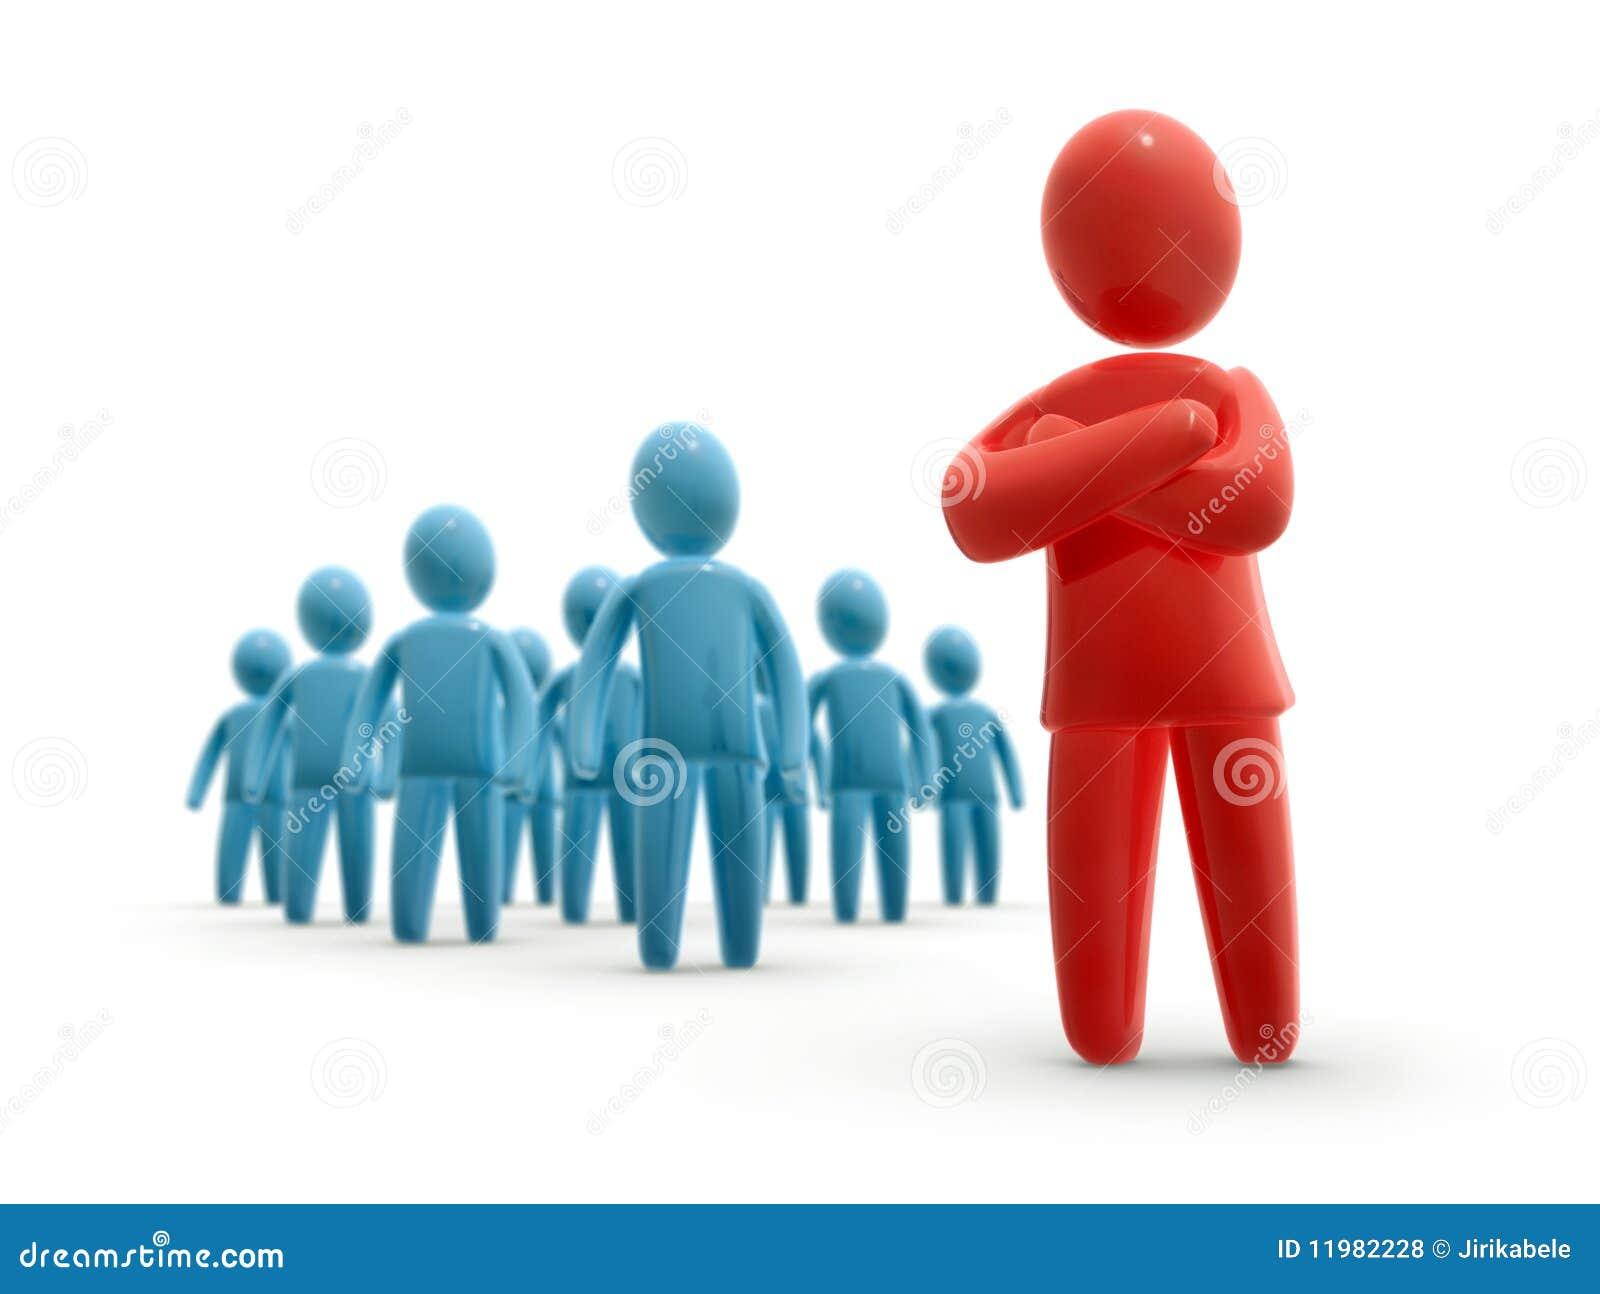 Leadership Royalty Free Stock Photos Image 11982228